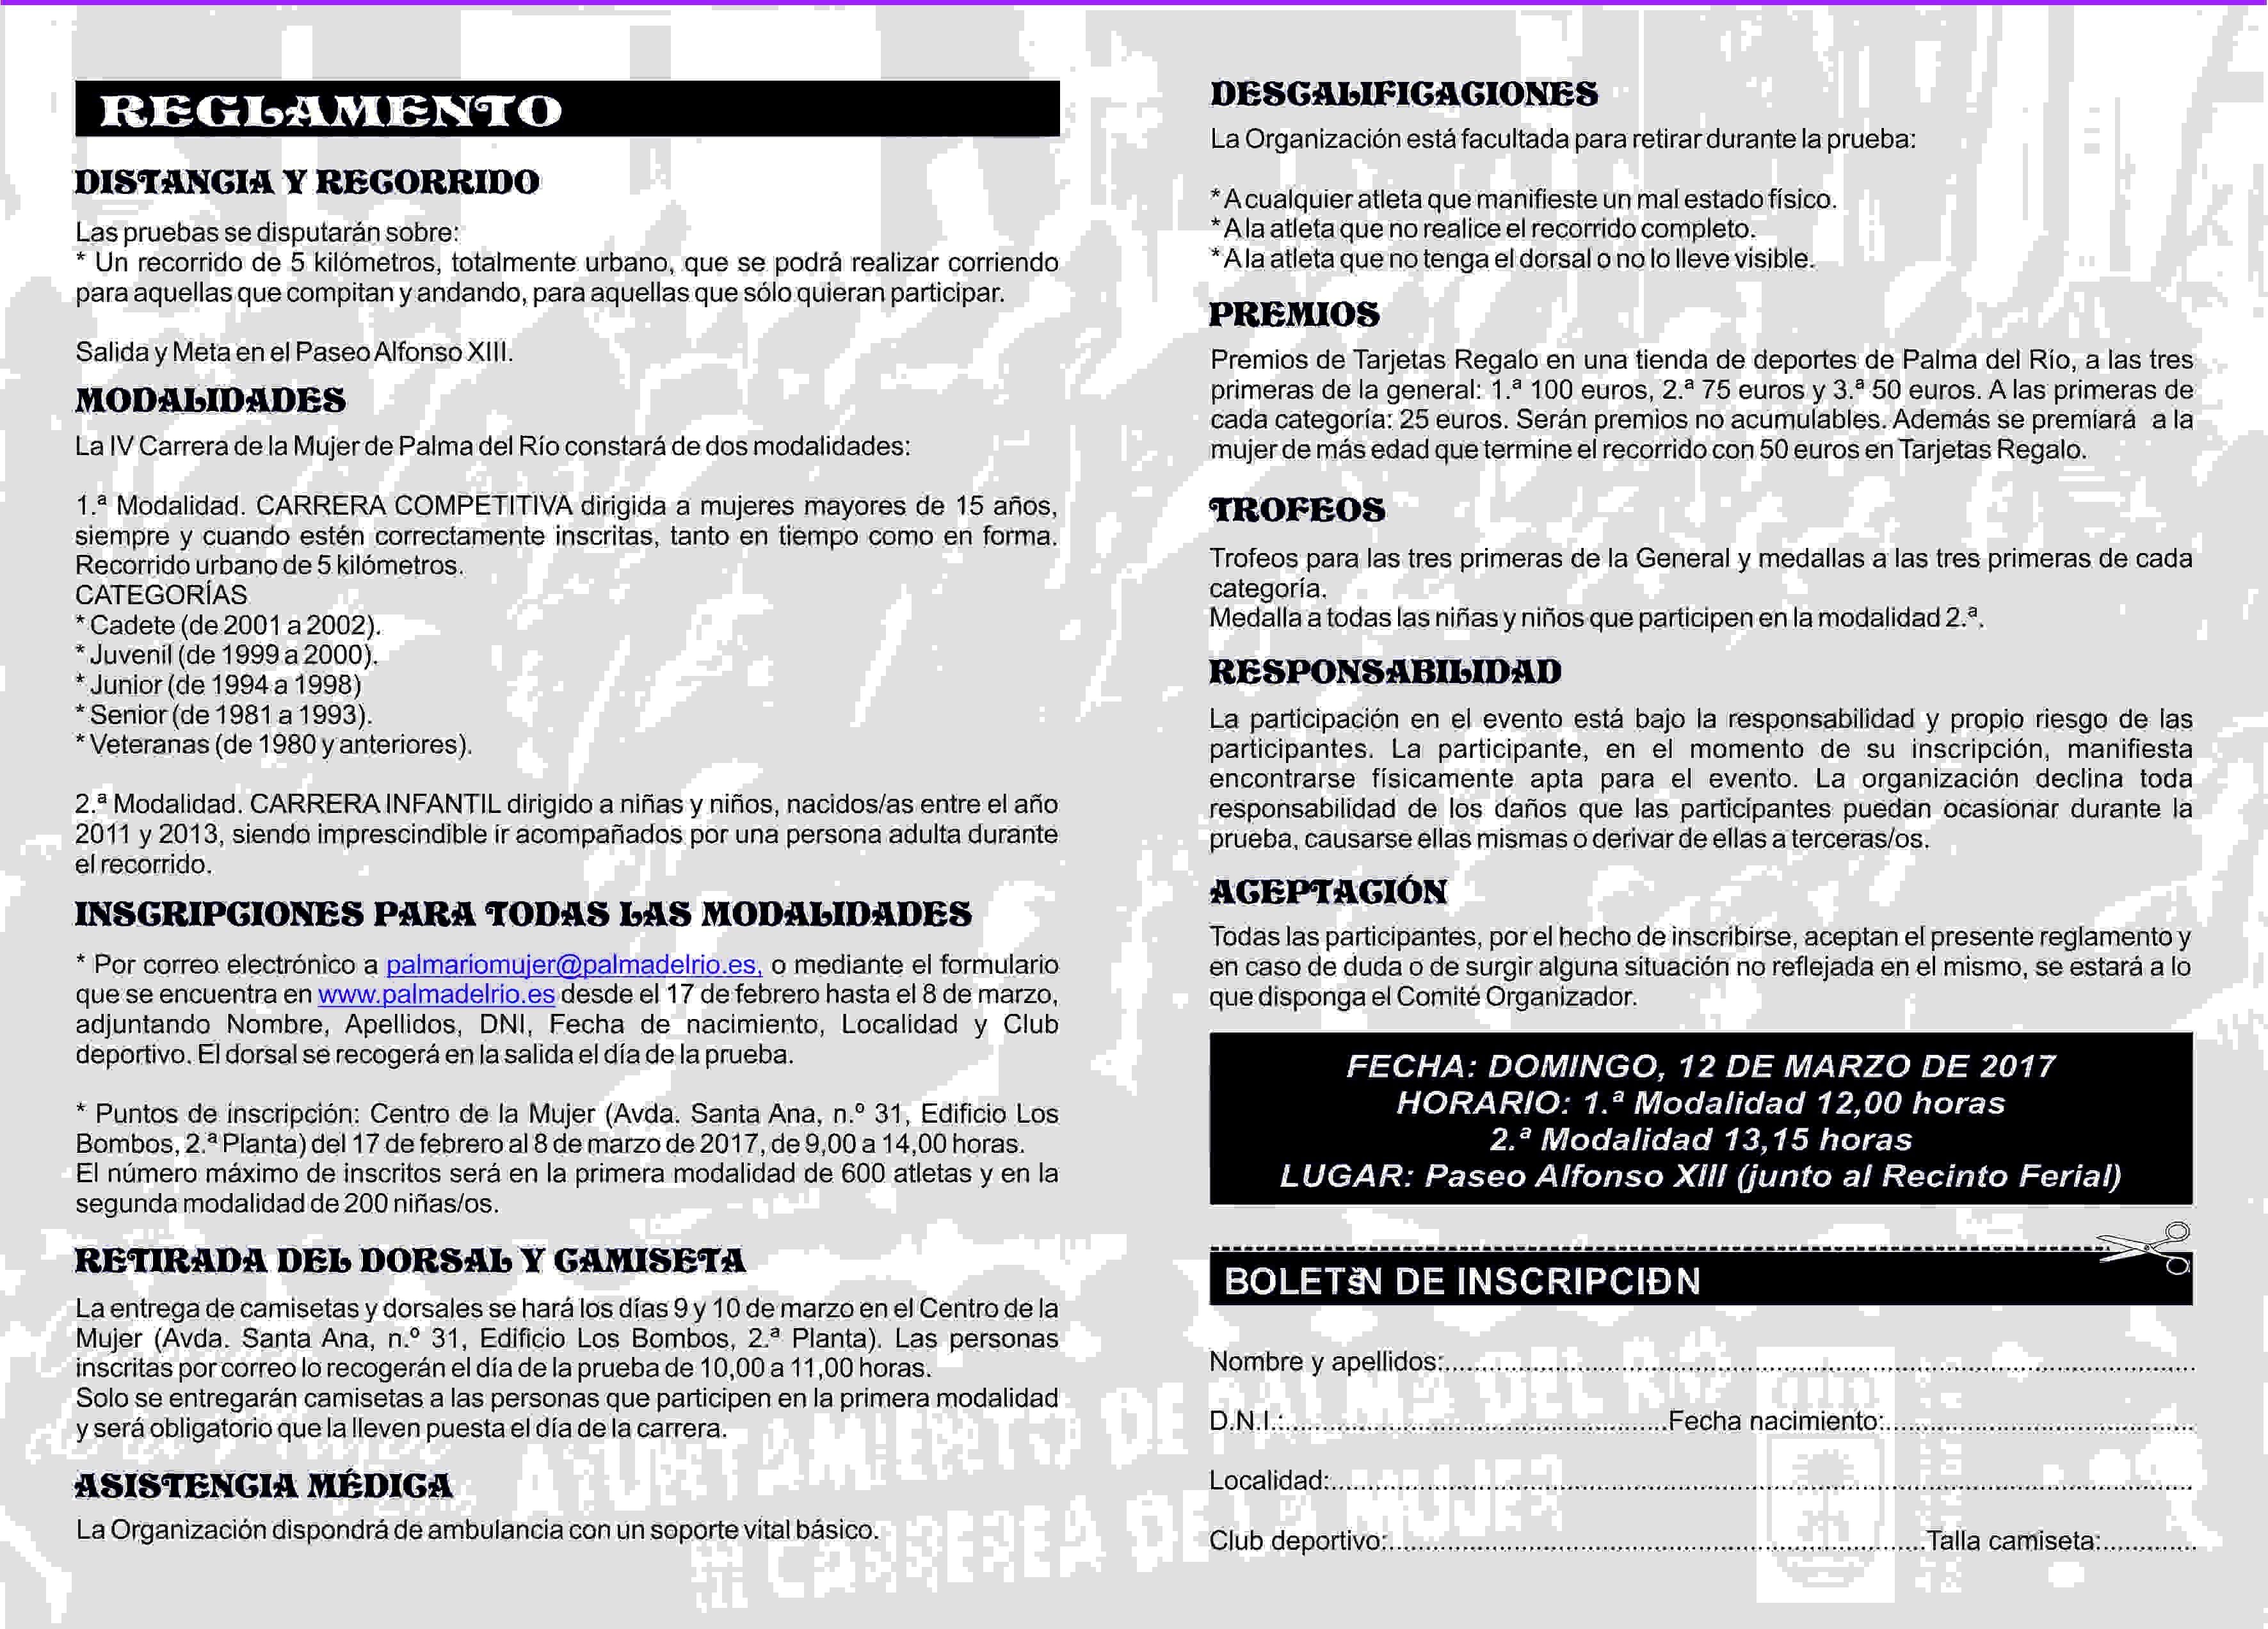 https://www.palmadelrio.es/sites/default/files/reglamento.carreradelamujer2017.jpg